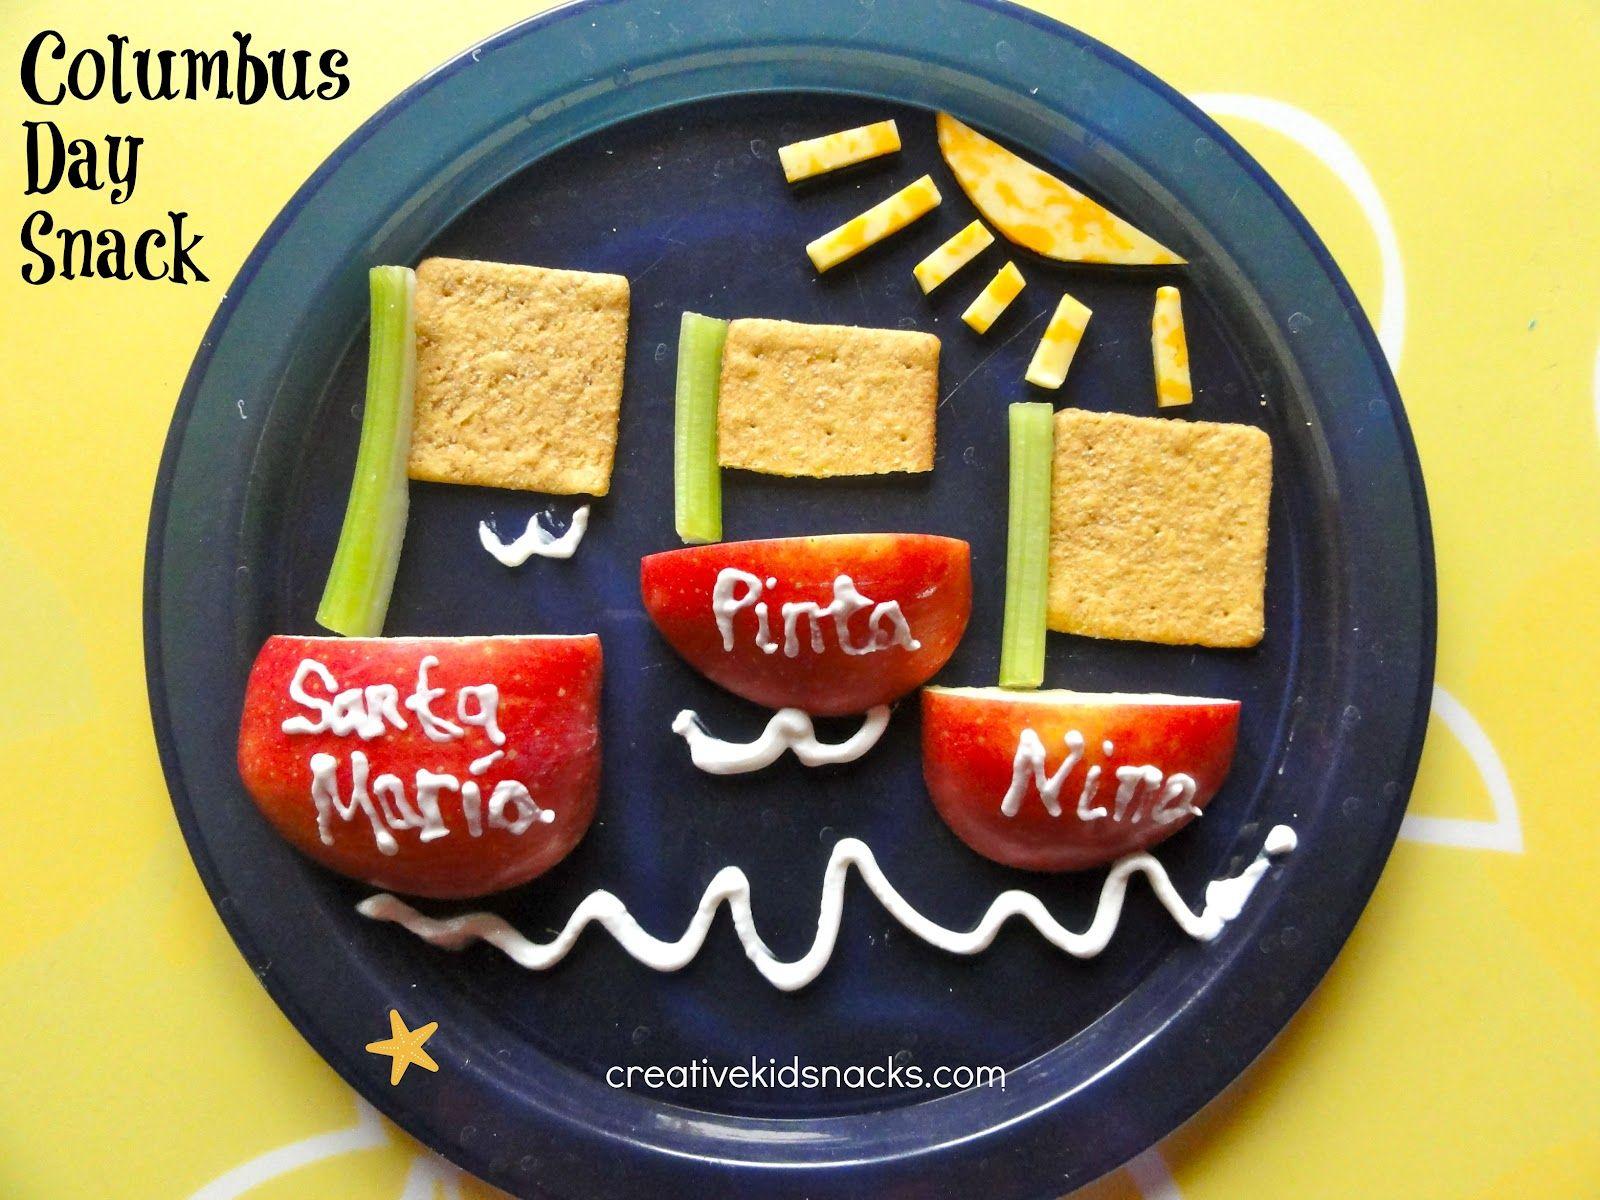 Creative Kid Snacks Columbus Day Snack